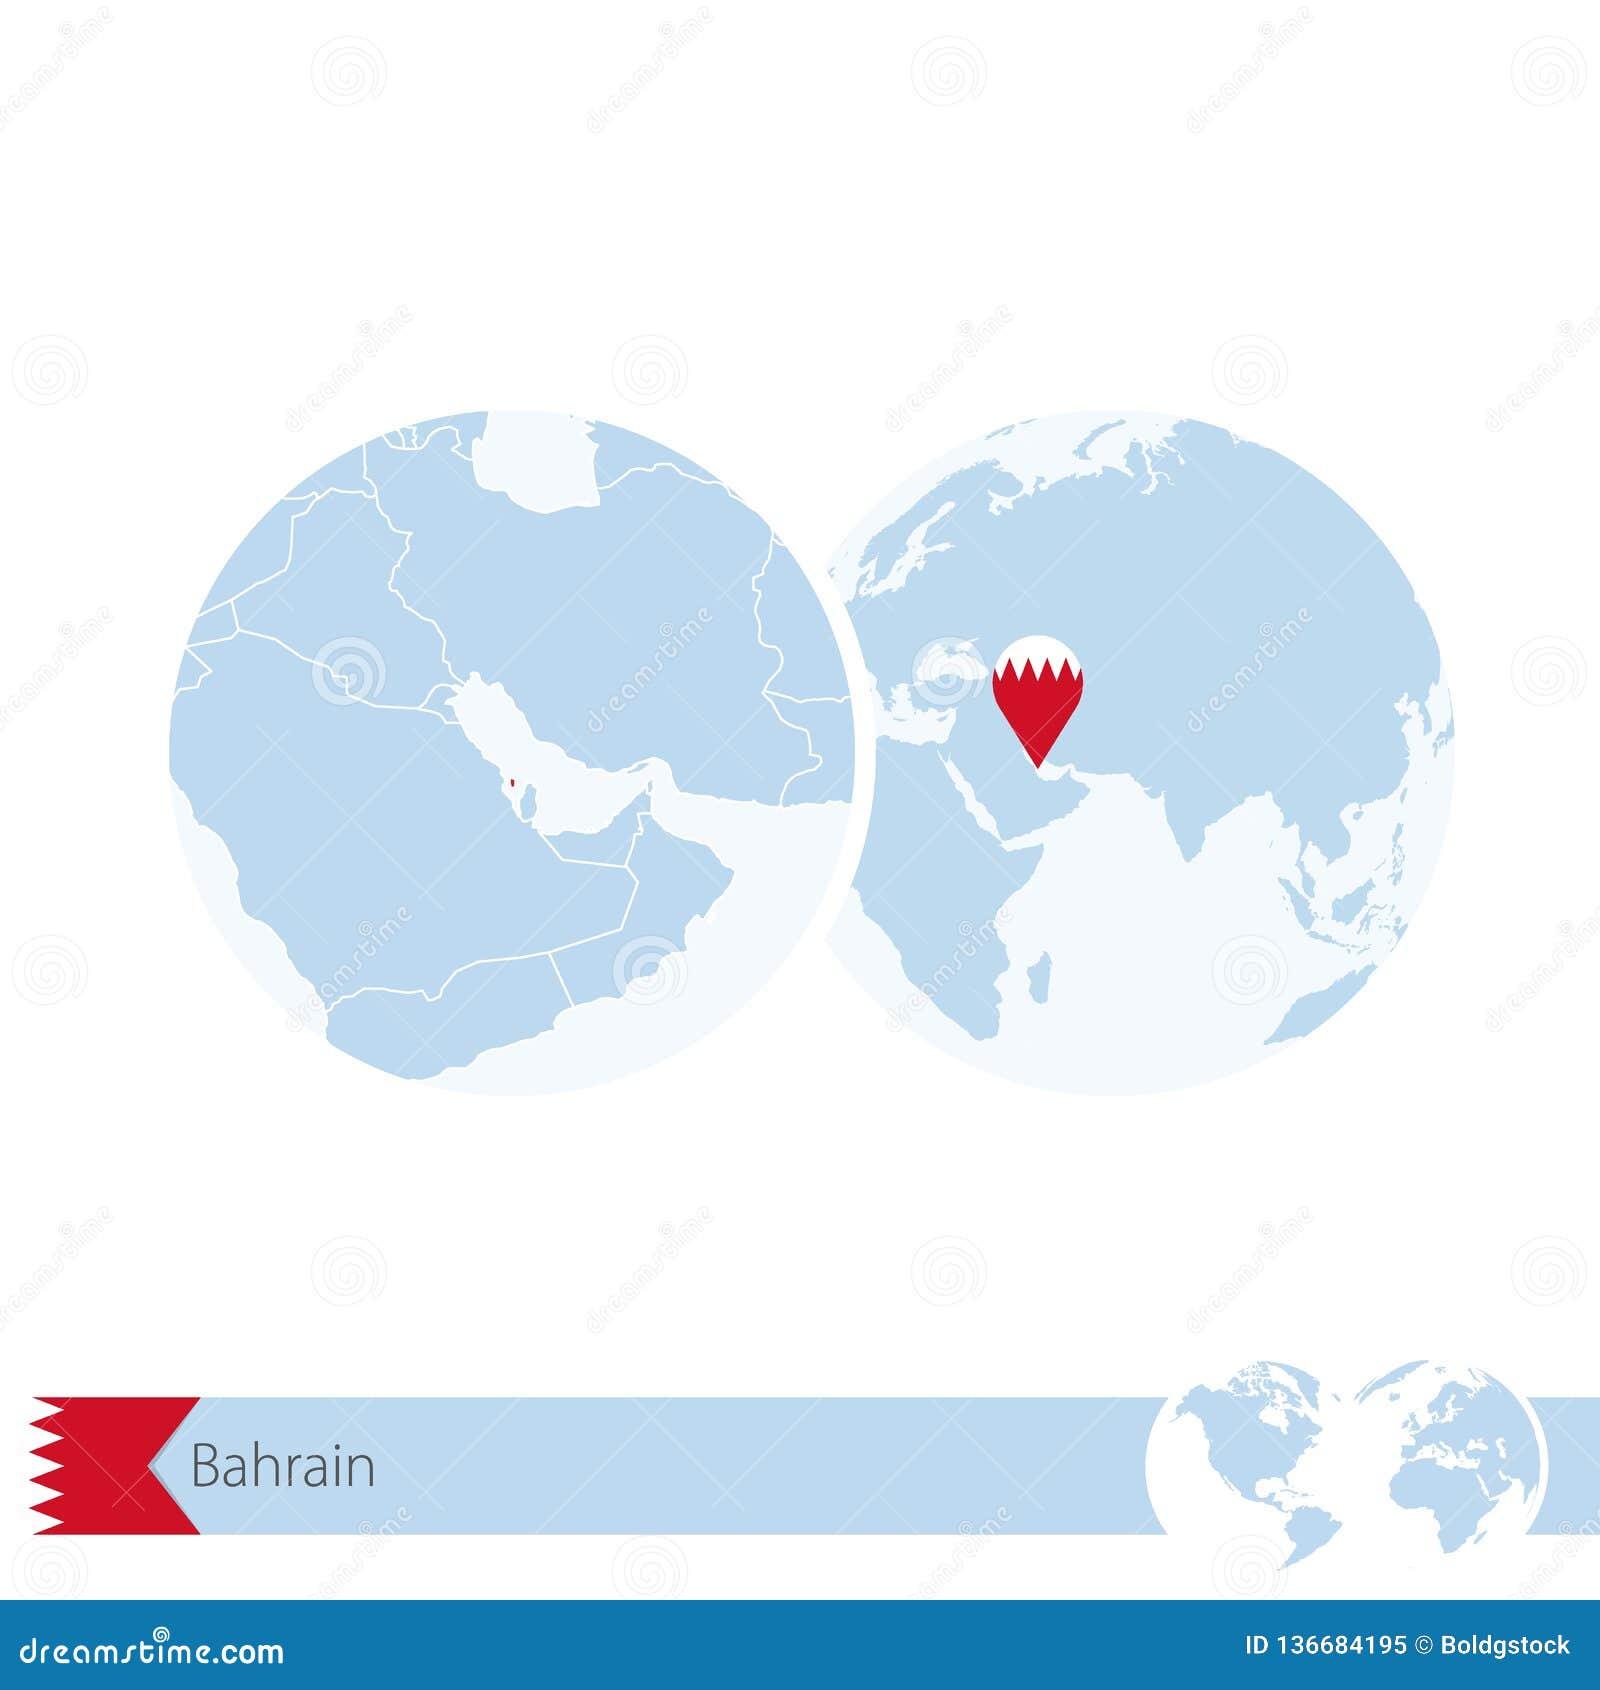 Bahrain On A World Map.Bahrain On World Globe With Flag And Regional Map Of Bahrain Stock